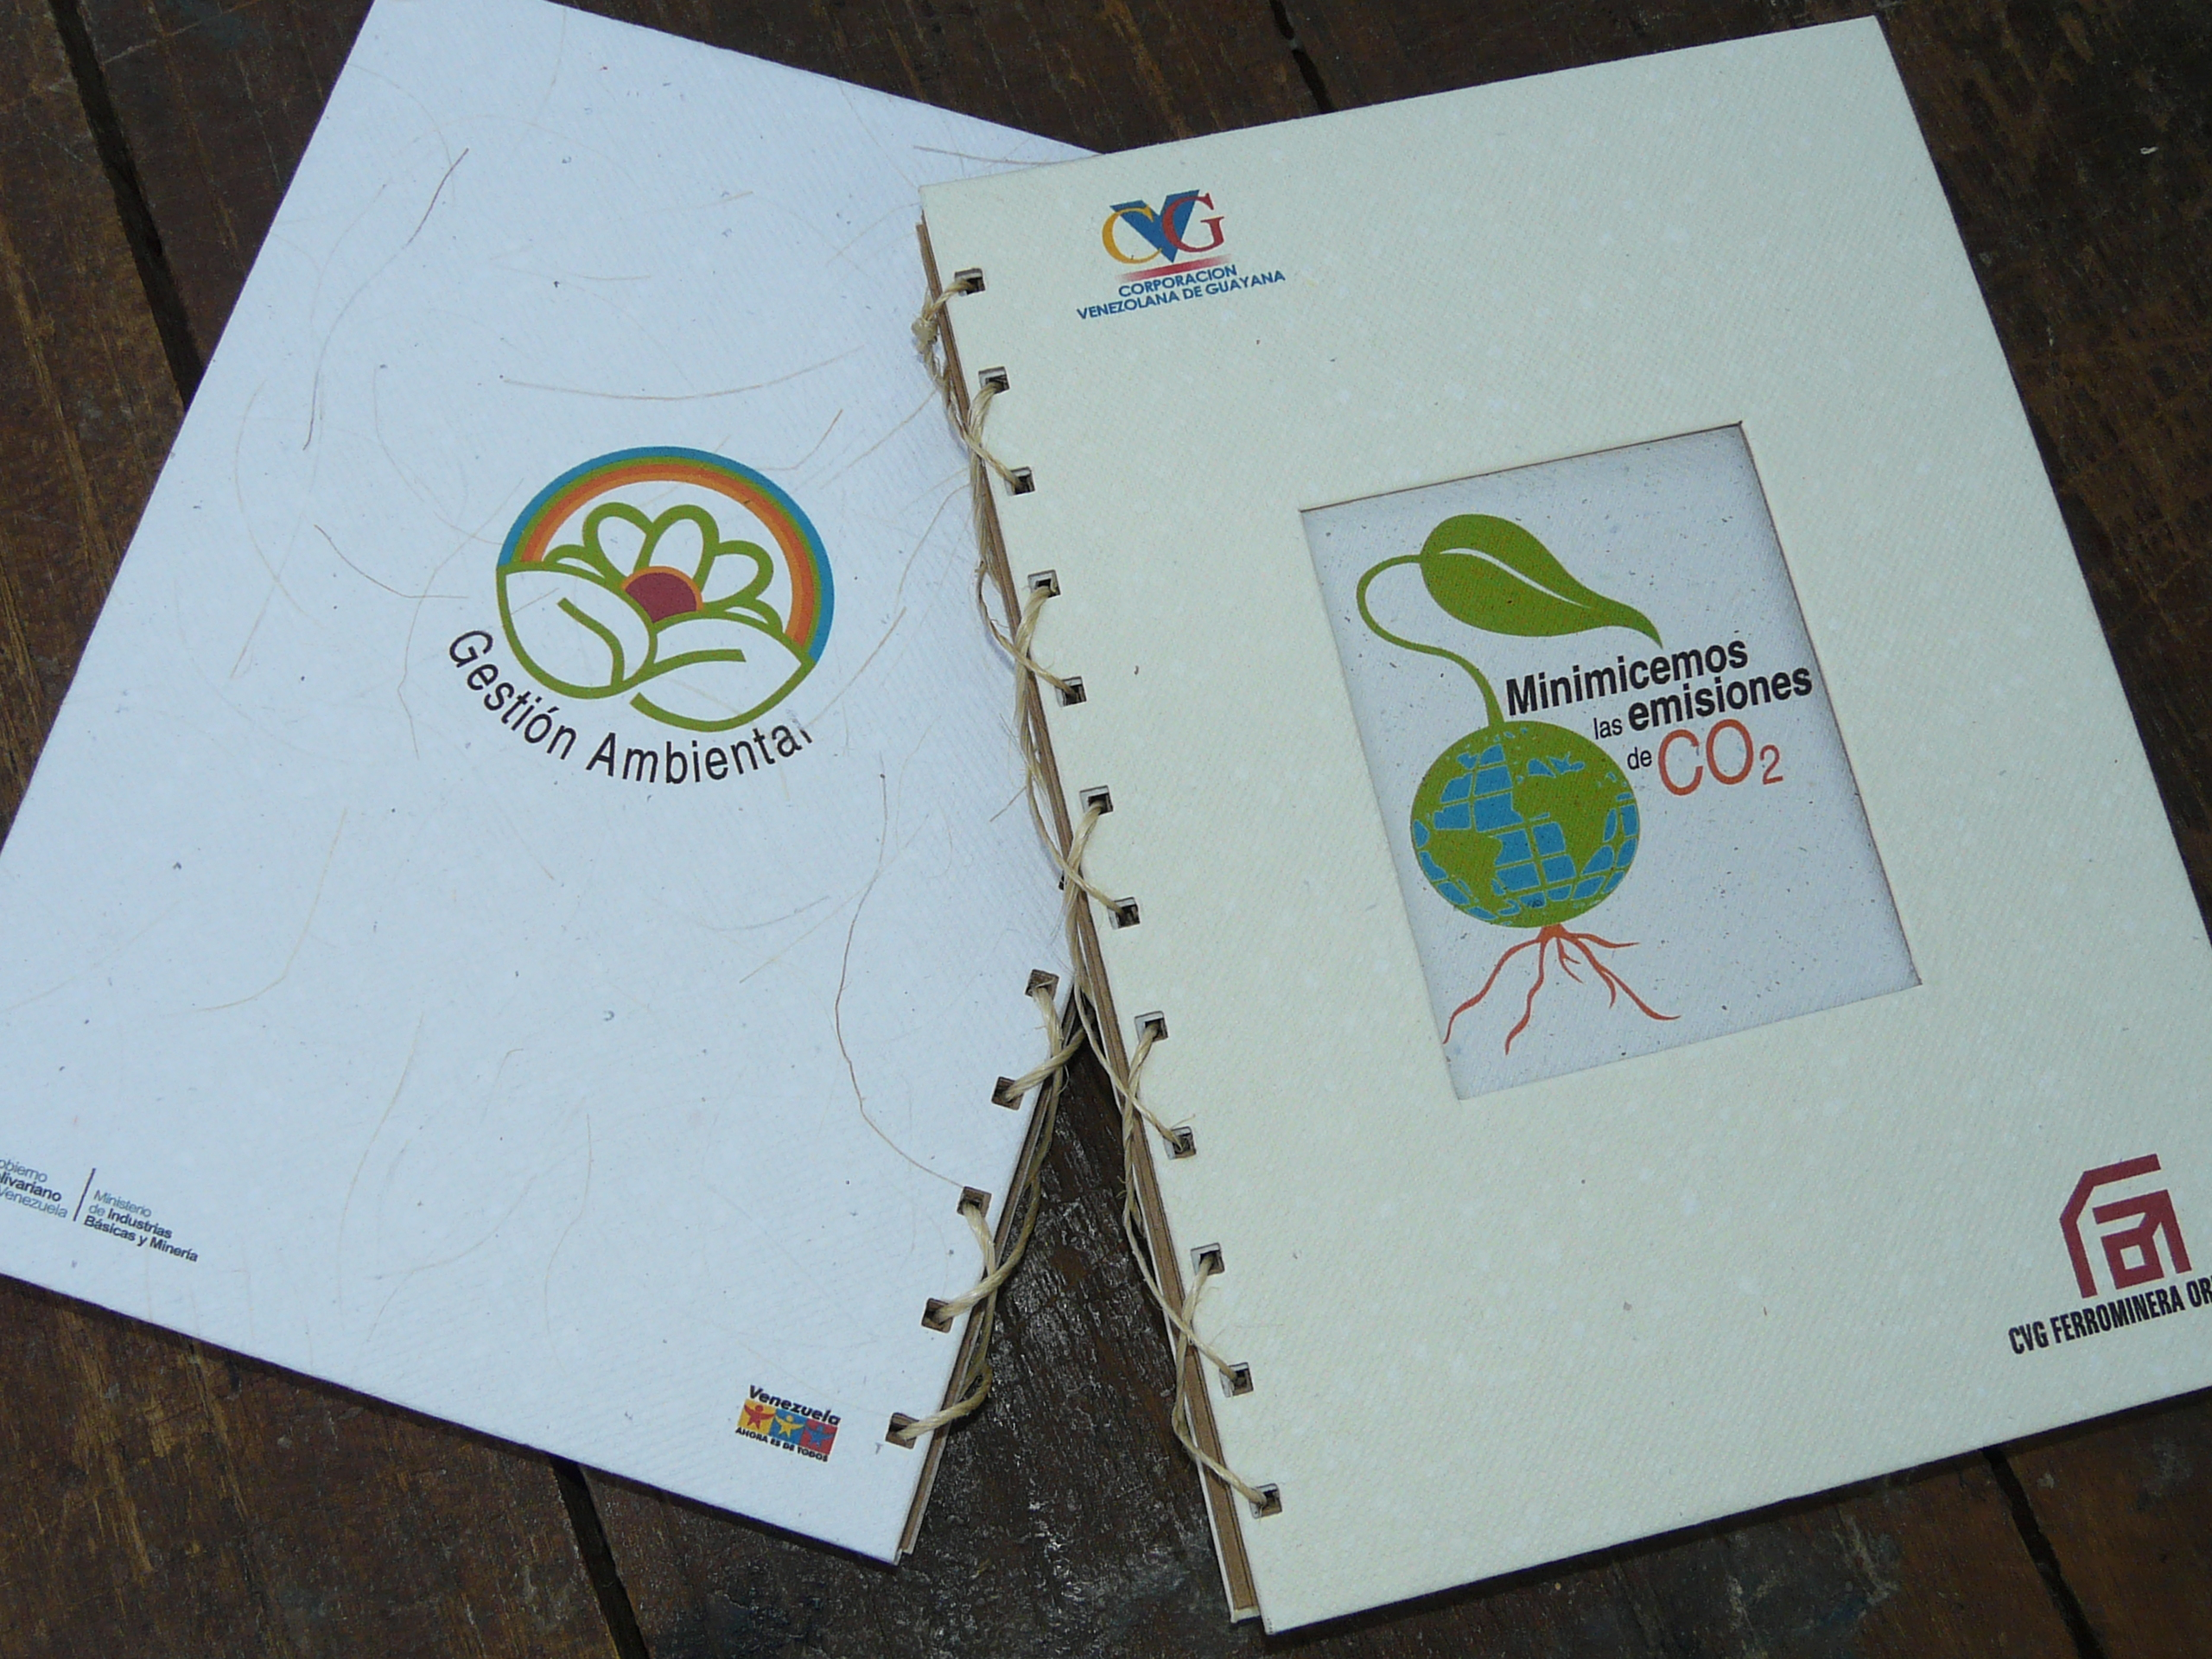 papel artesanal u0026 39 s blog